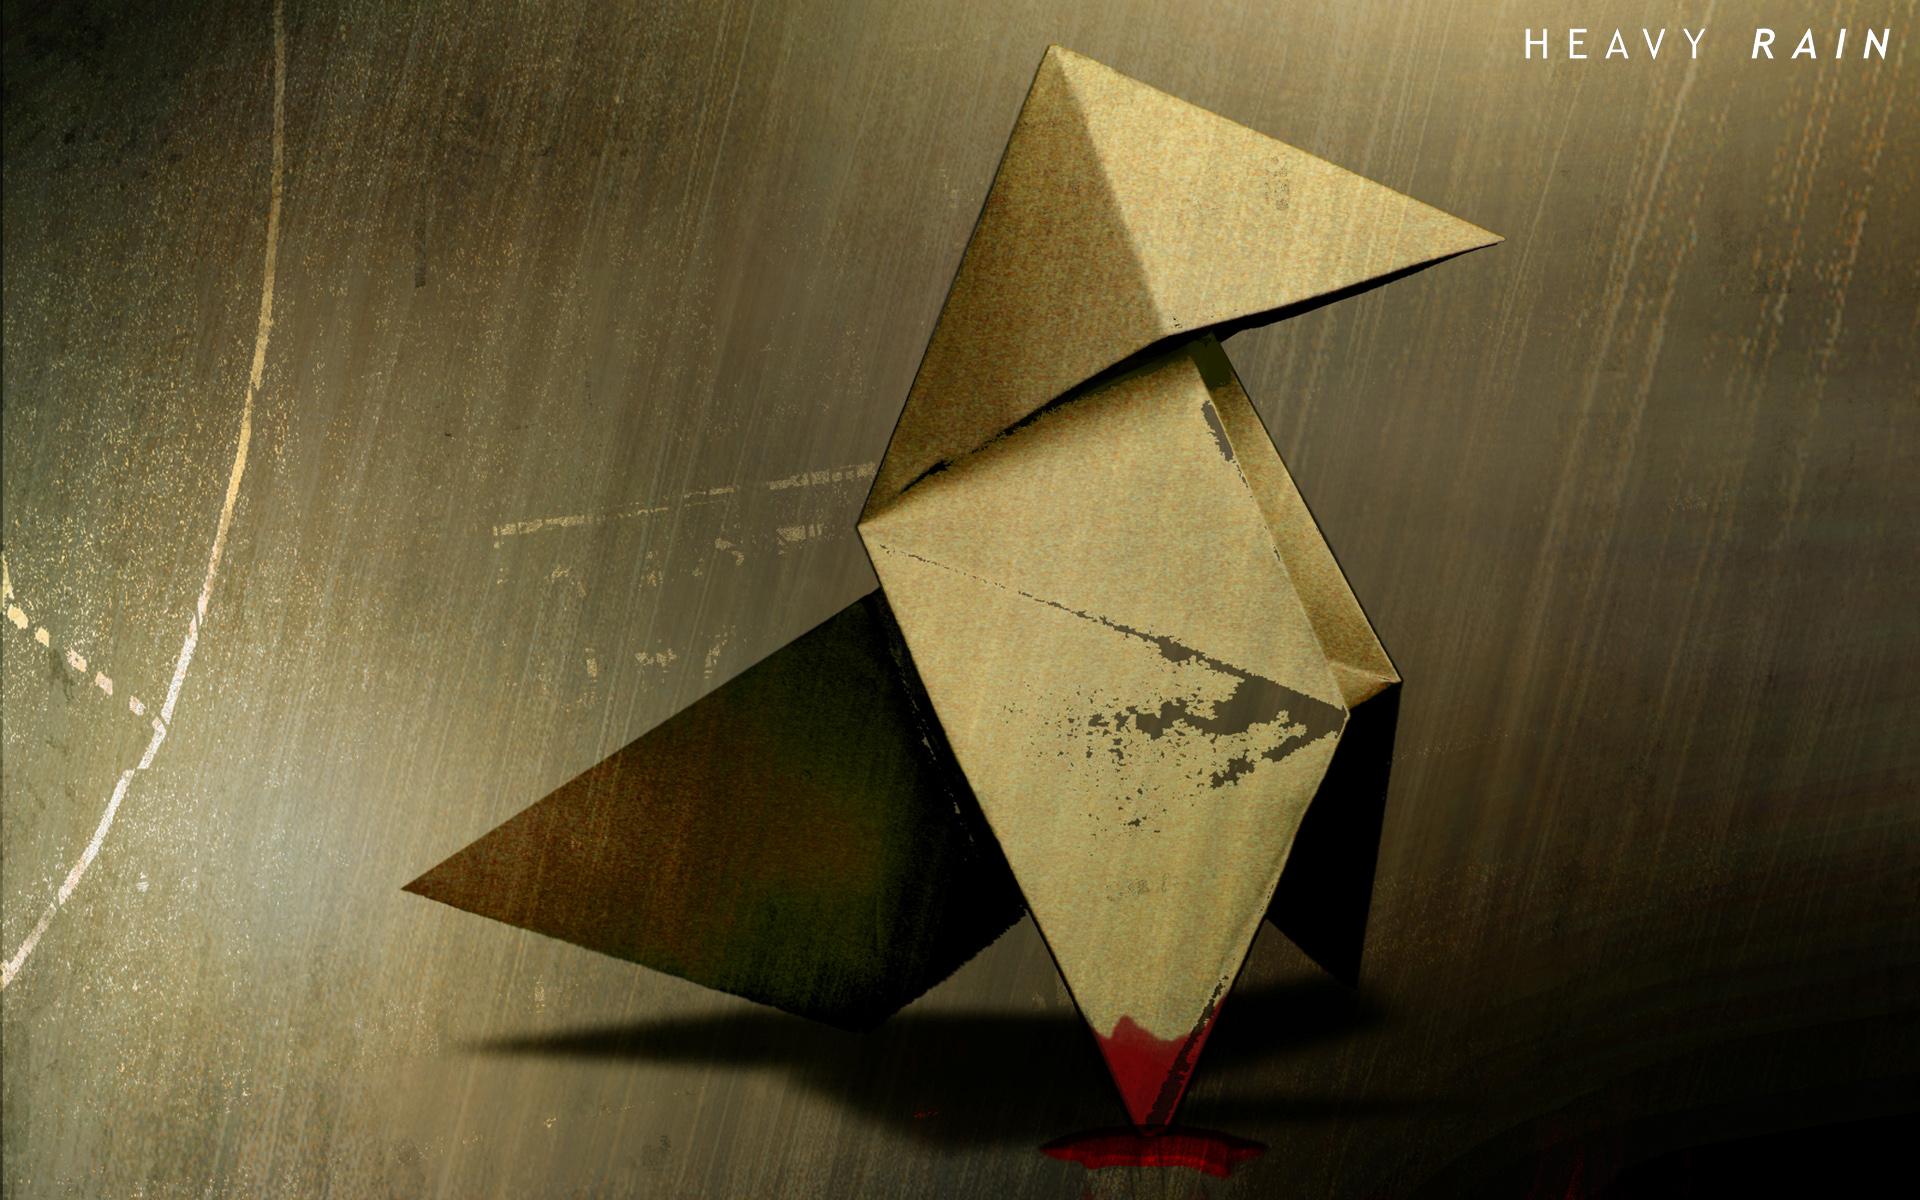 Wallpaper symmetry triangle heavy rain art leaf crane symmetry triangle origami paper heavy rain art leaf crane shape wing origami paper art paper quantic jeuxipadfo Images